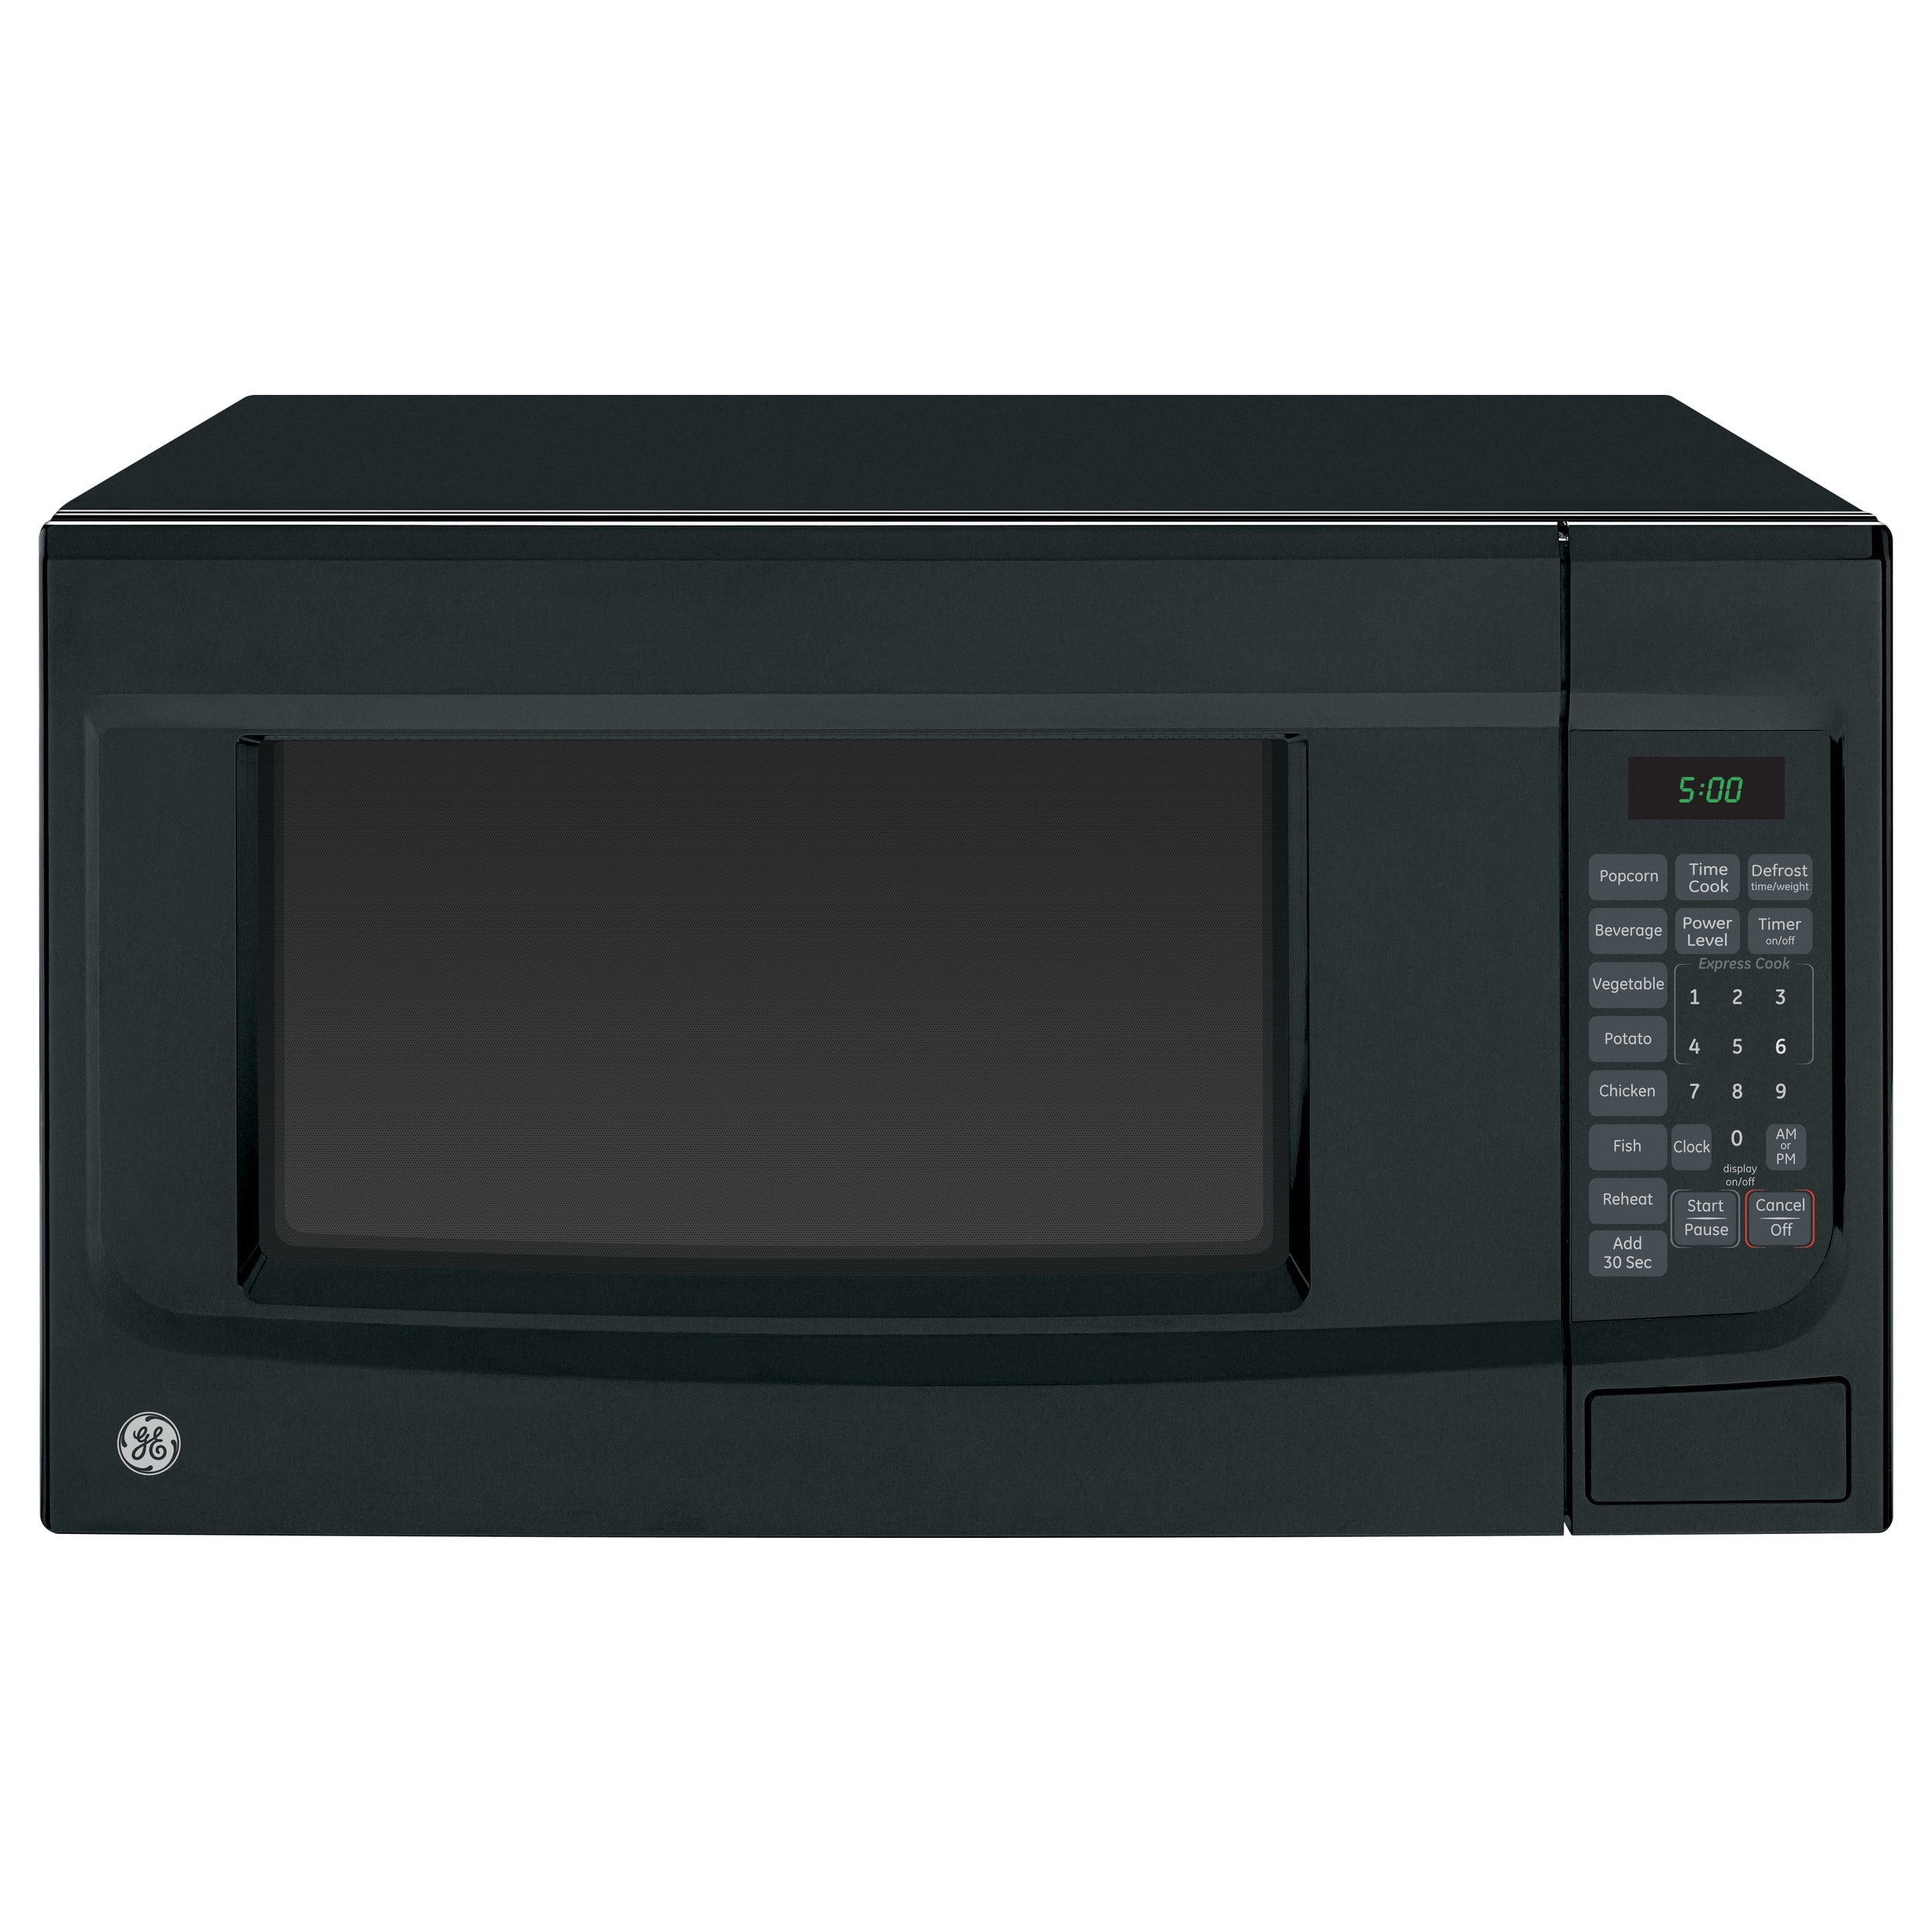 GE Black 1.4-cubic foot Countertop Microwave Oven GE JES1460DSBB 1.4 cuft. Countertop Microwave Oven